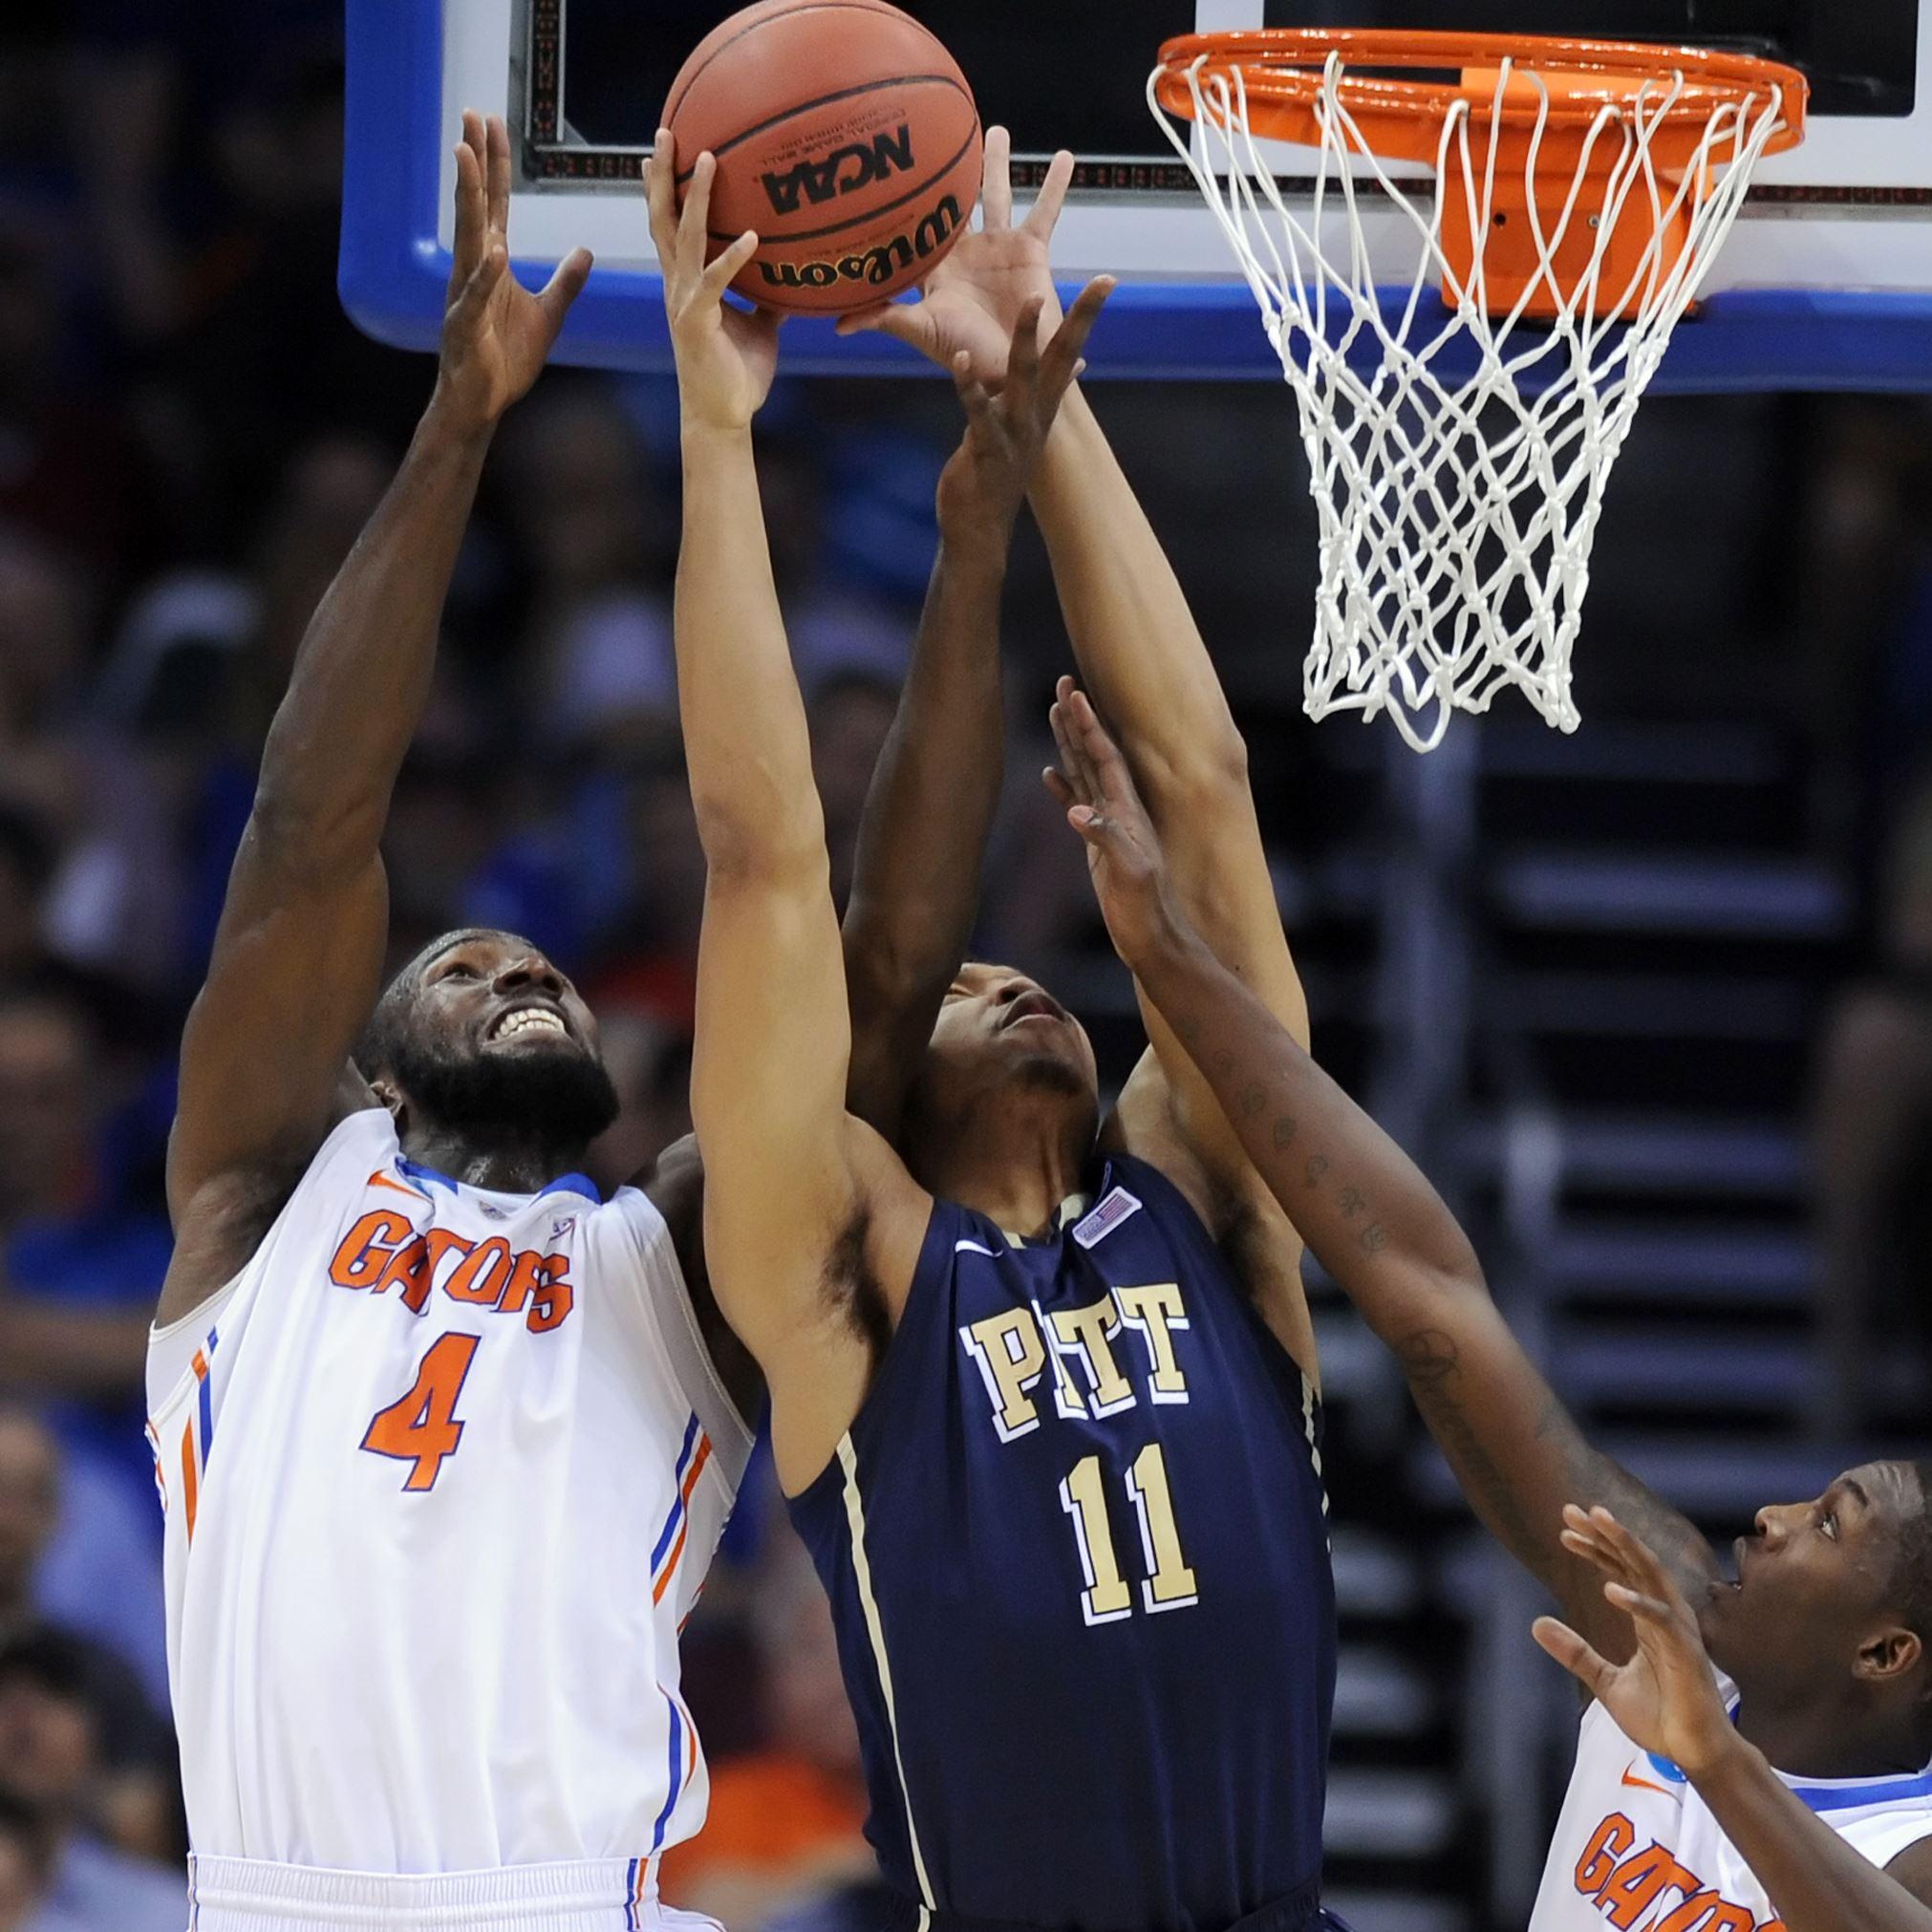 Pitt crumbles in third...